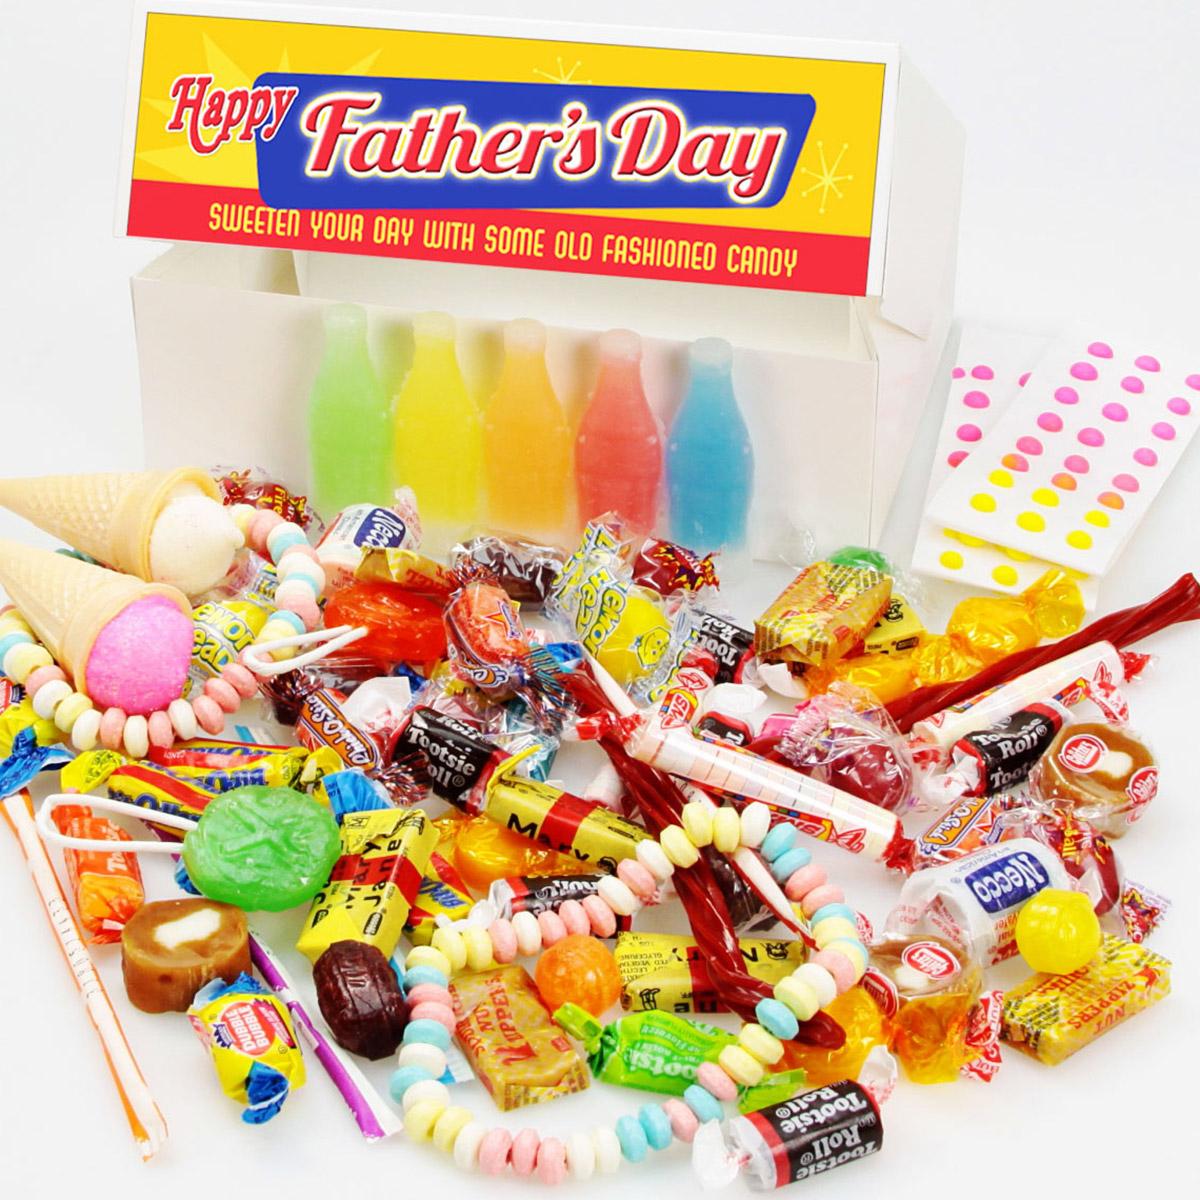 Fathers Day Old Fashioned Penny Candy Box Vintage Style Nostalgic Gift Ebay